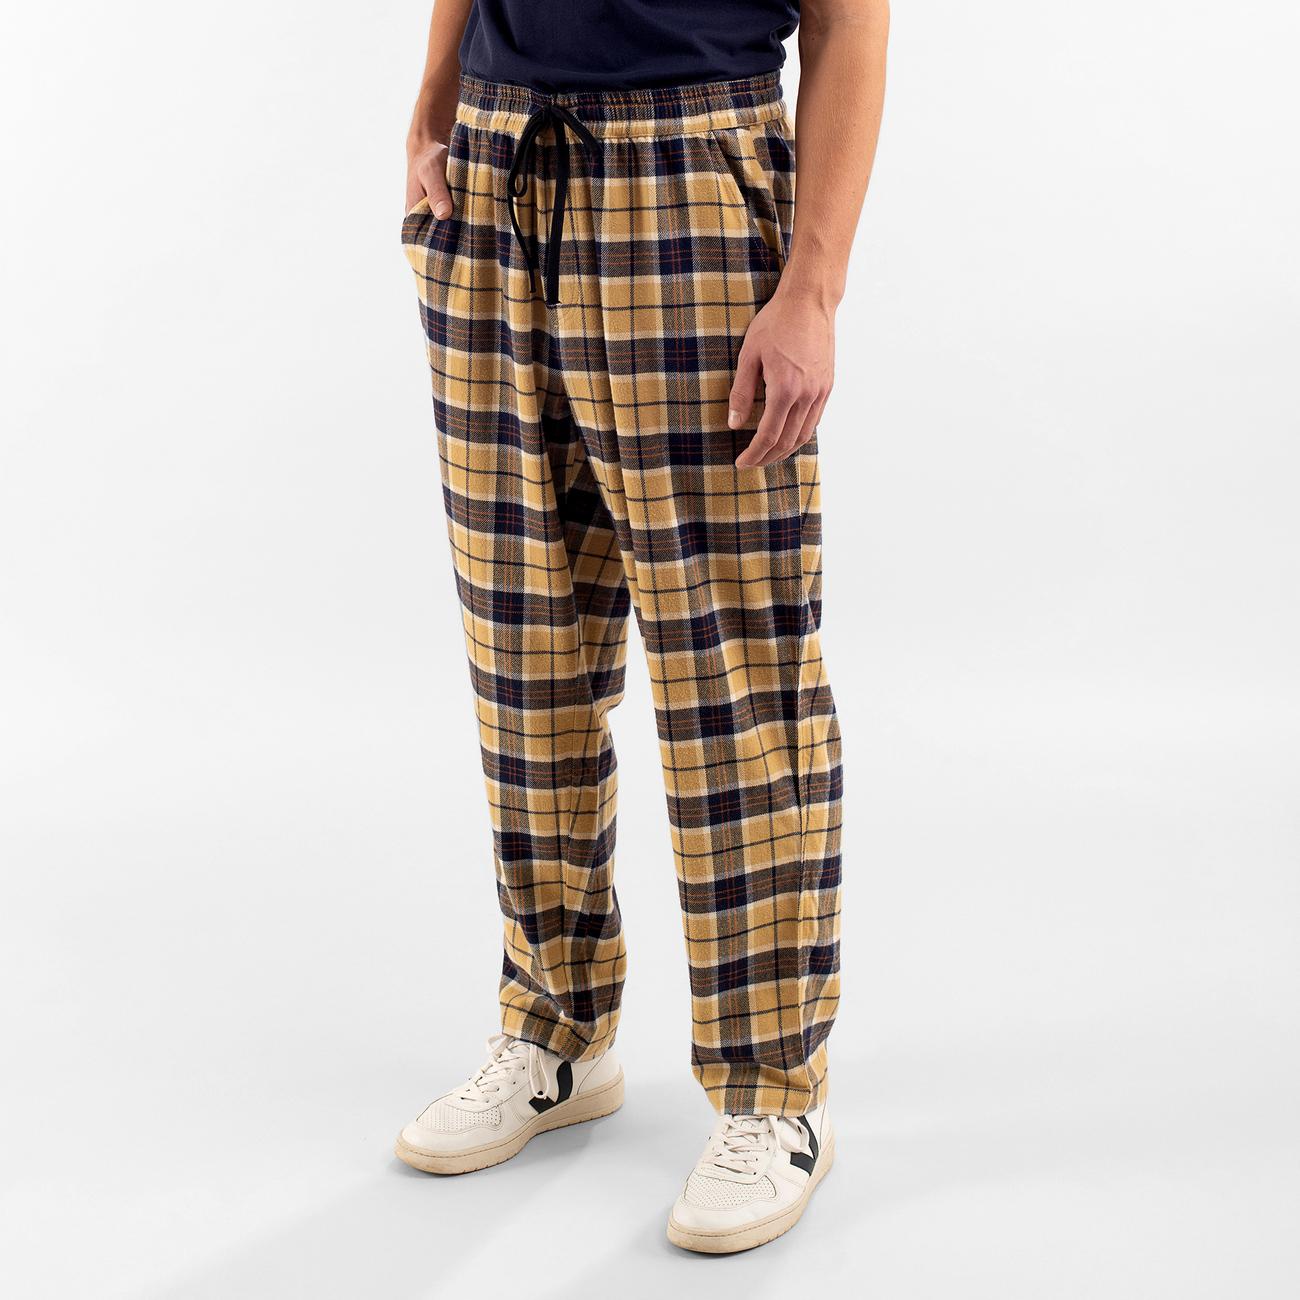 Pants Ljugarn Flannel Checker Beige